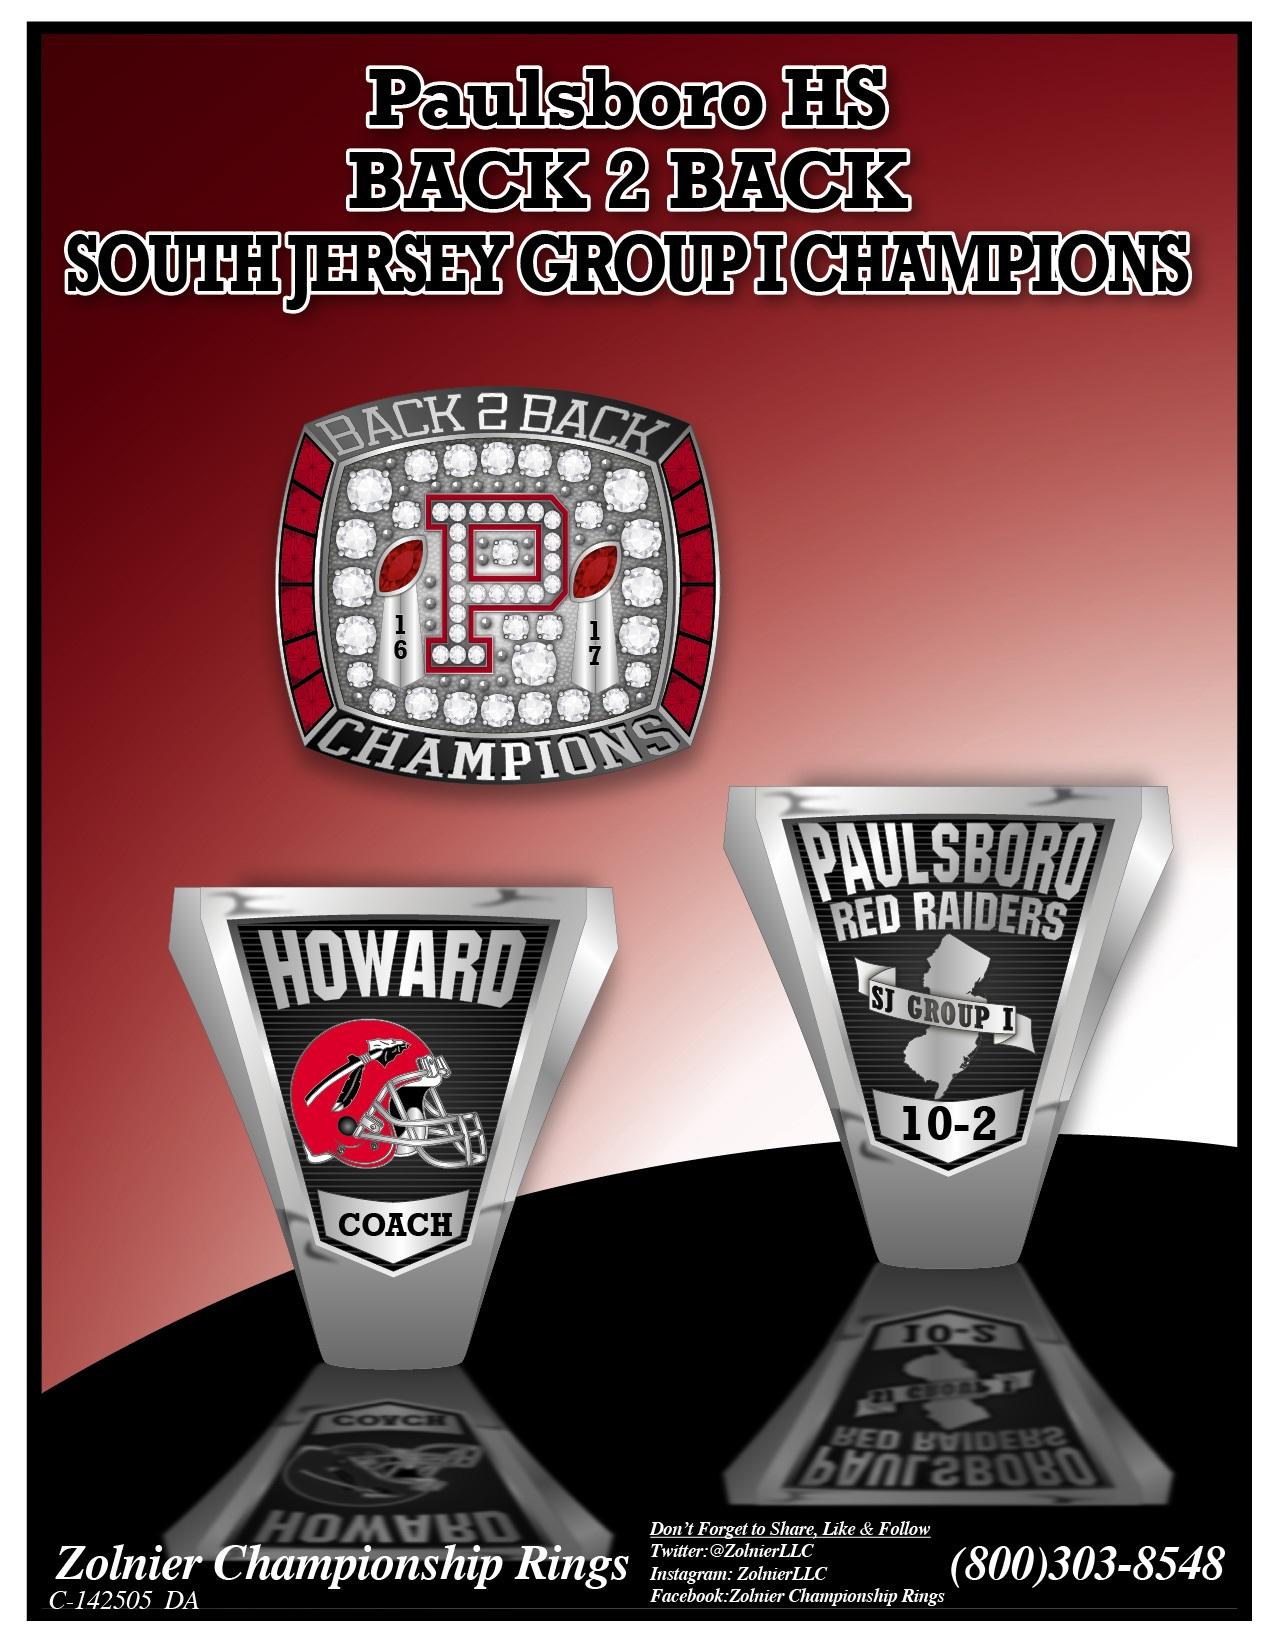 C-142505 Paulsboro Football FINAL DESIGN